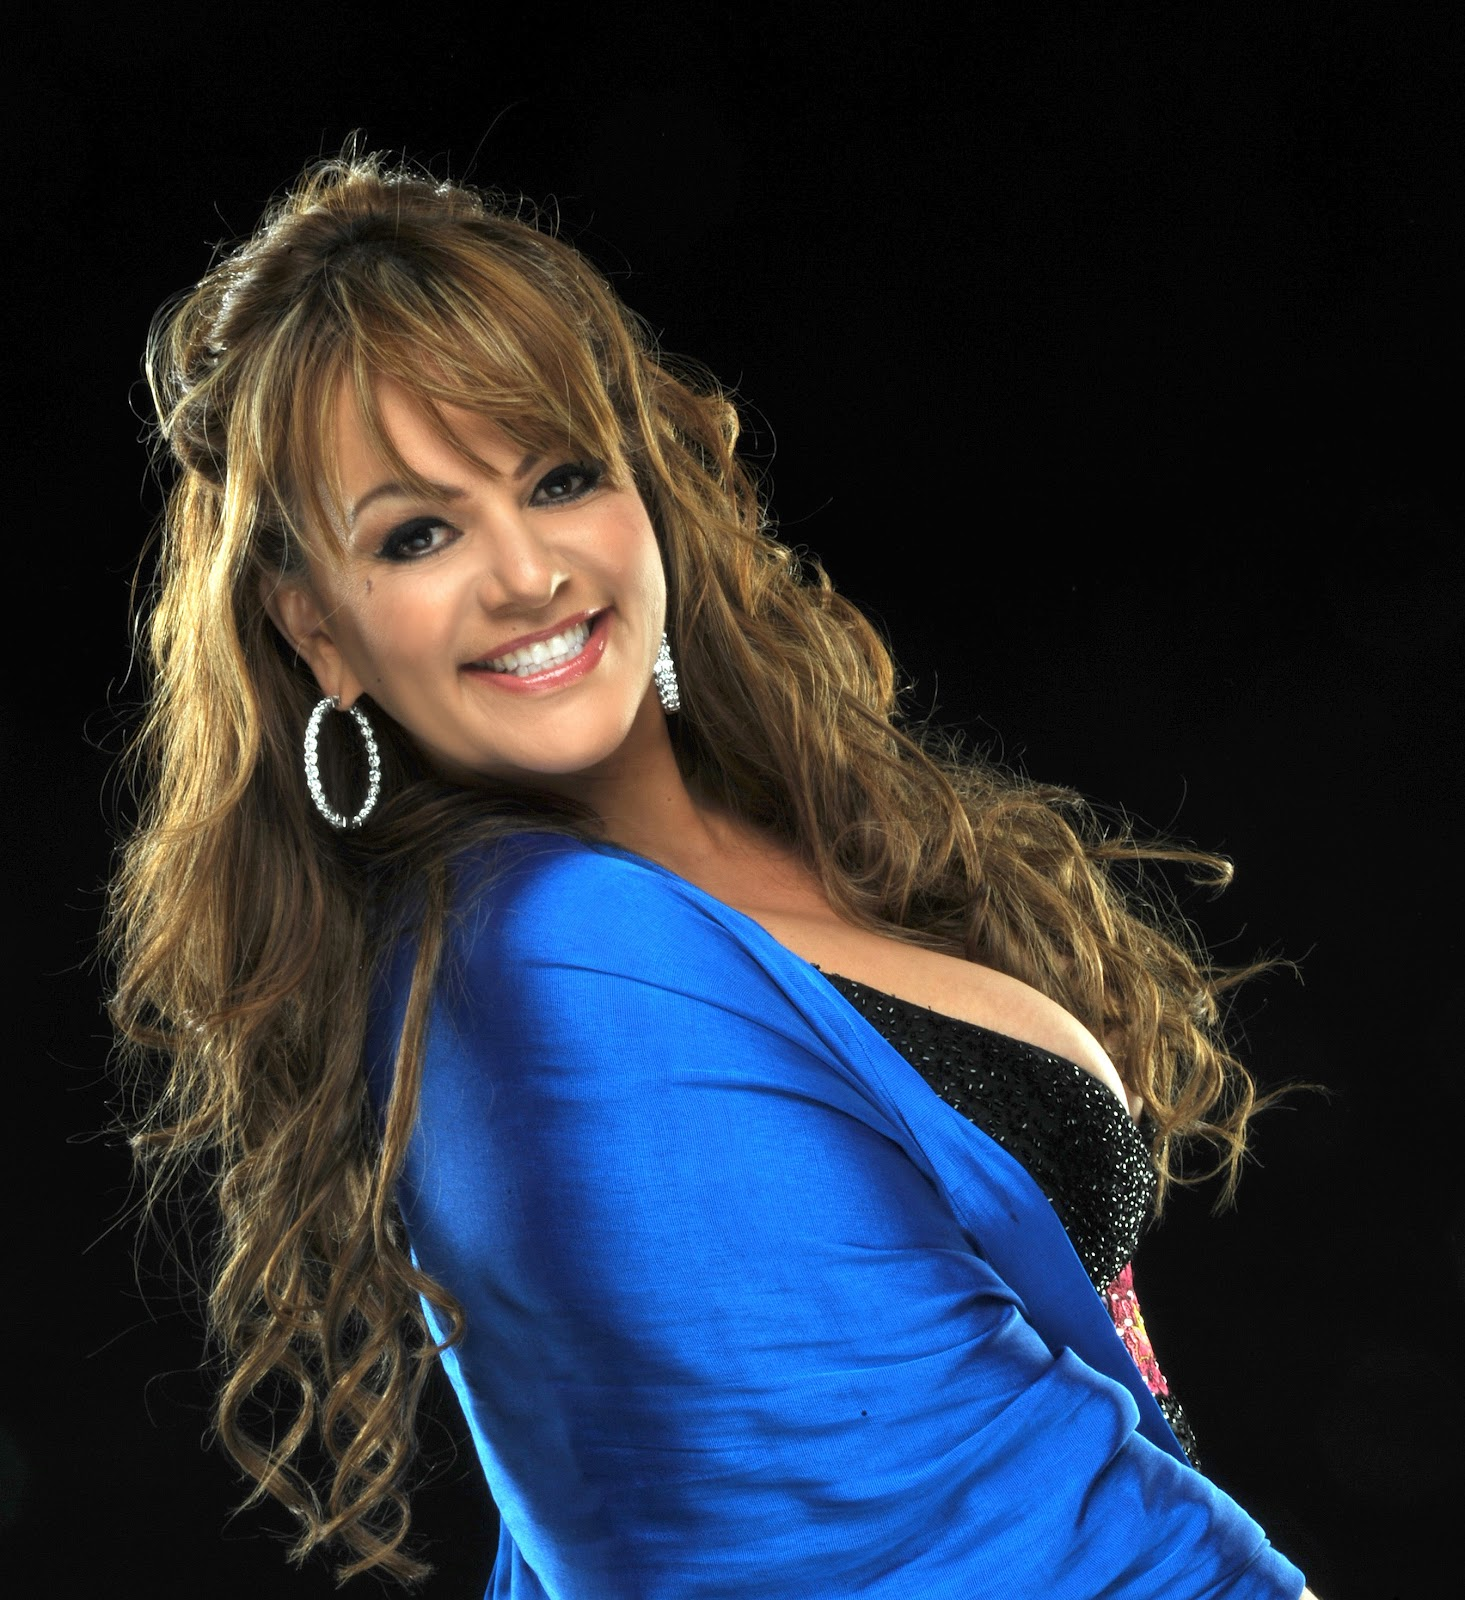 Escuchar Musica De Jenni Rivera Gratis Canciones De Jenni